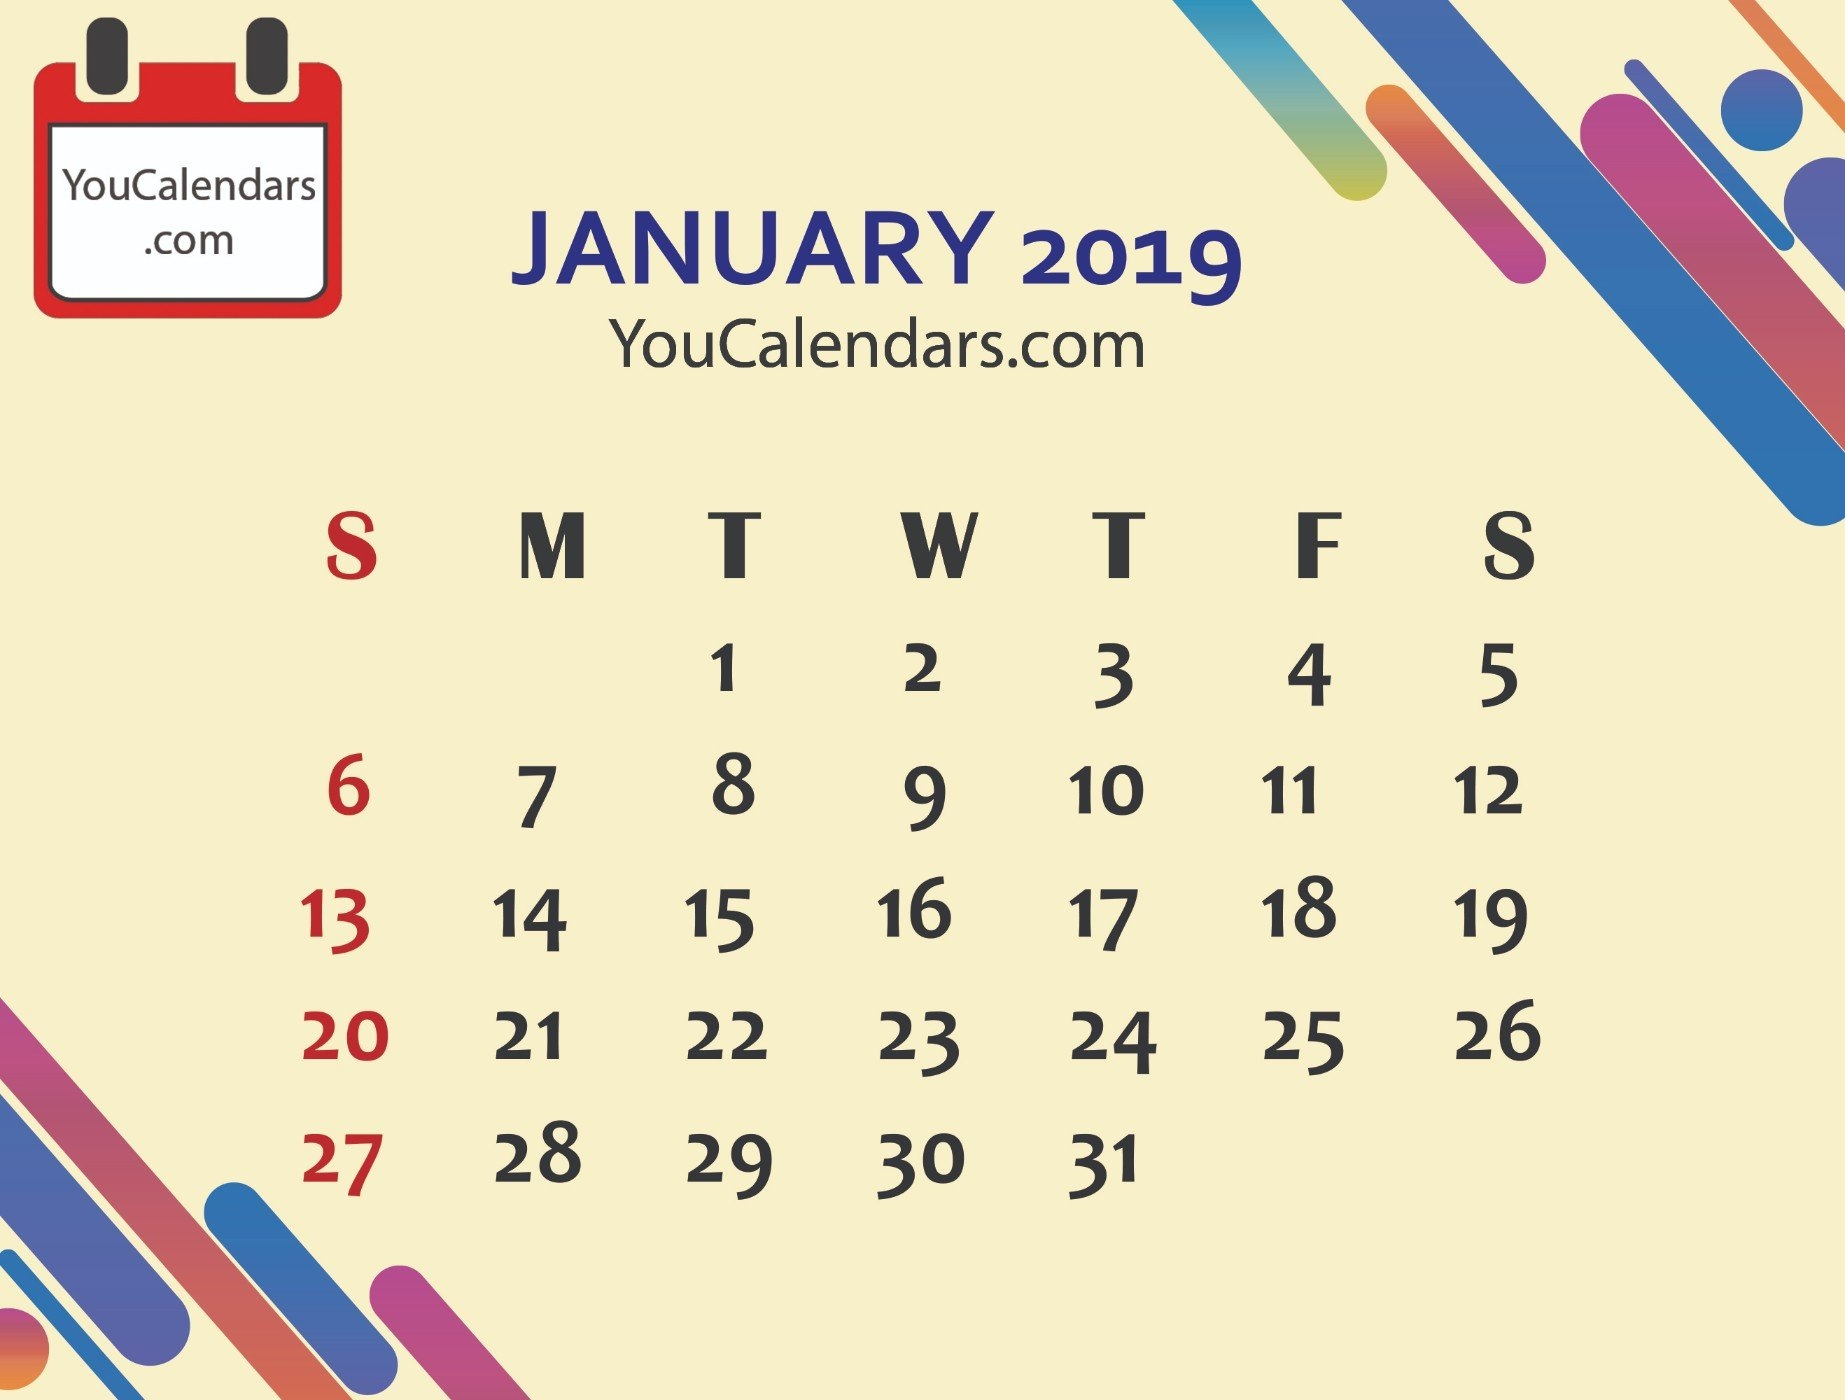 Free January 2019 Calendar Printable Template – You Calendars January 8 2019 Calendar